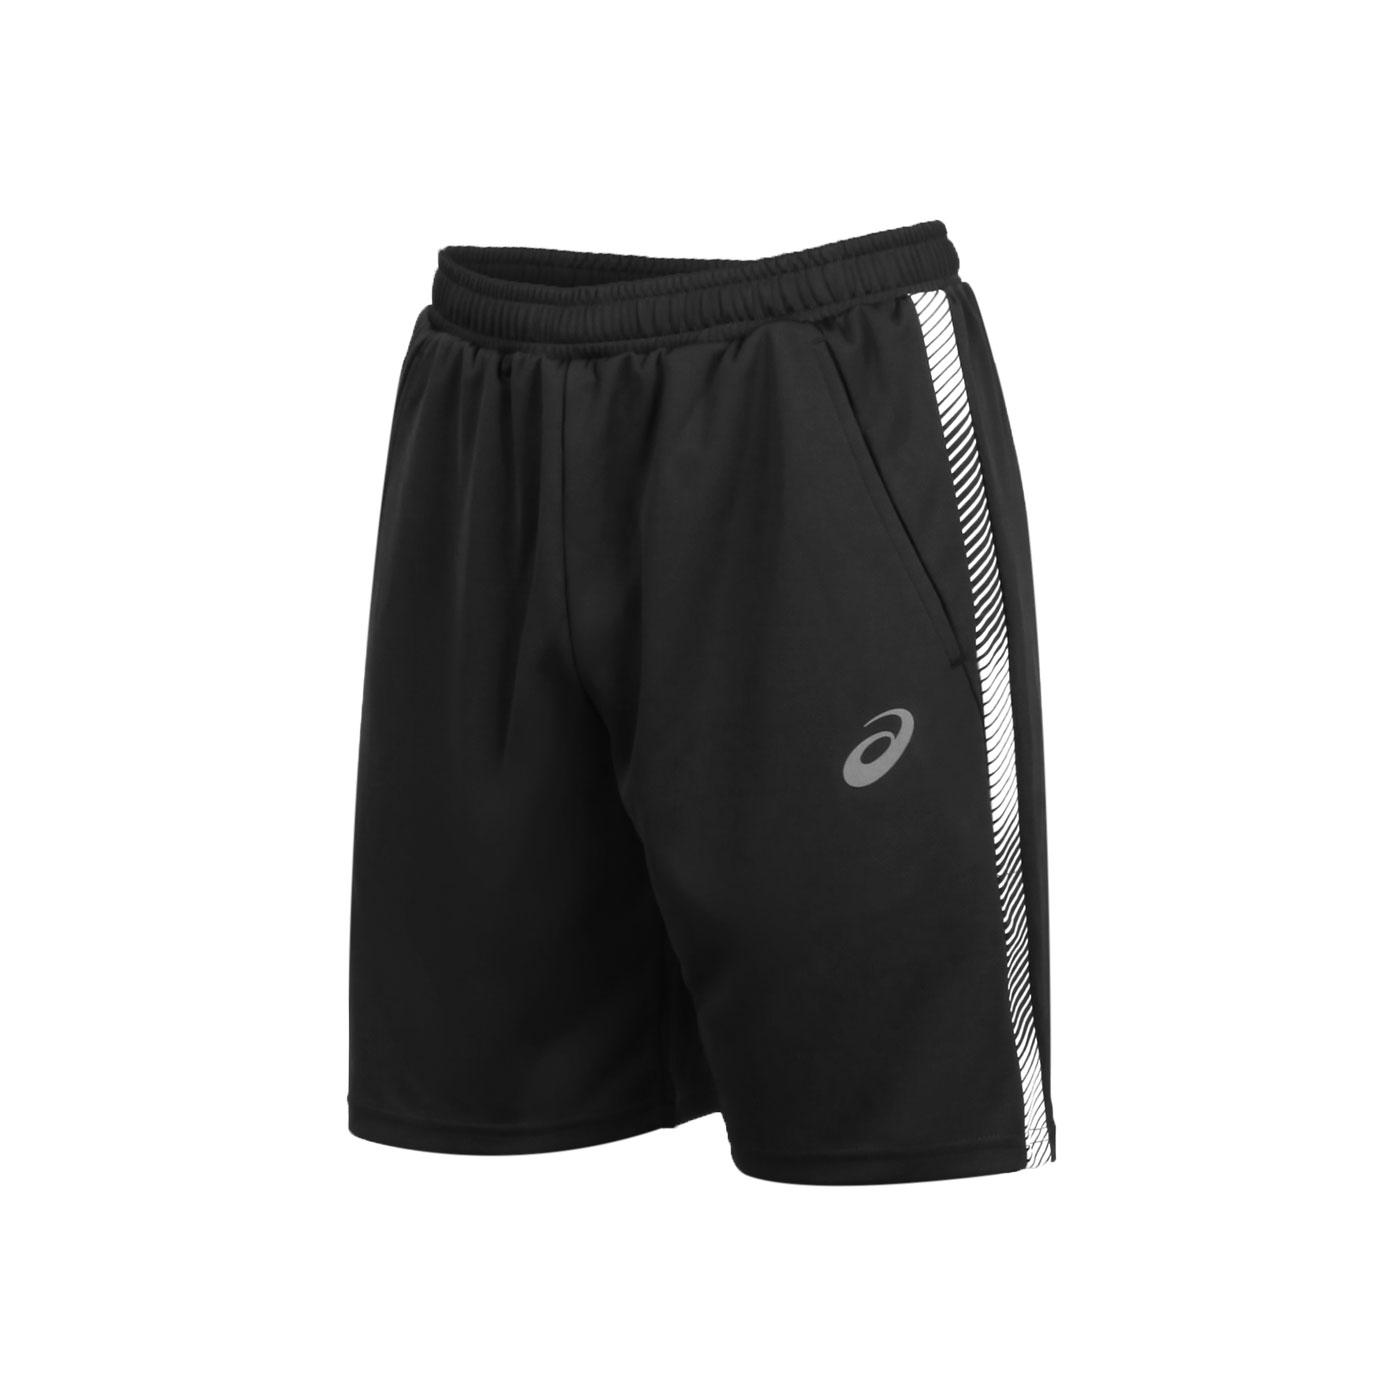 ASICS 男款針織運動短褲 K32036-50 - 黑白銀